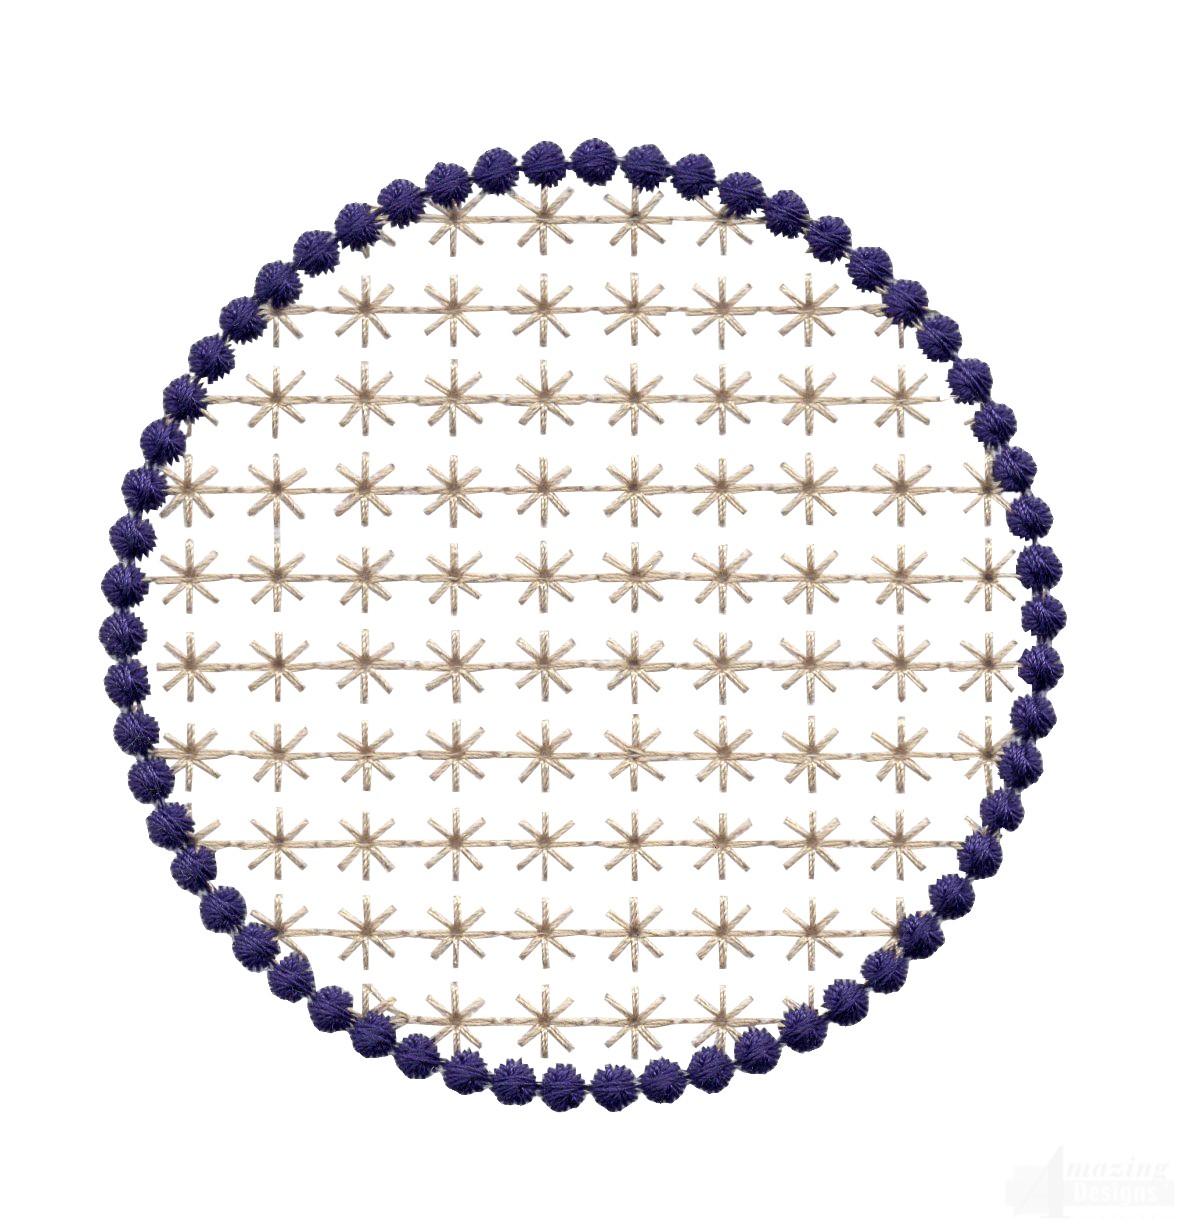 Flowering eyelet circle embroidery design